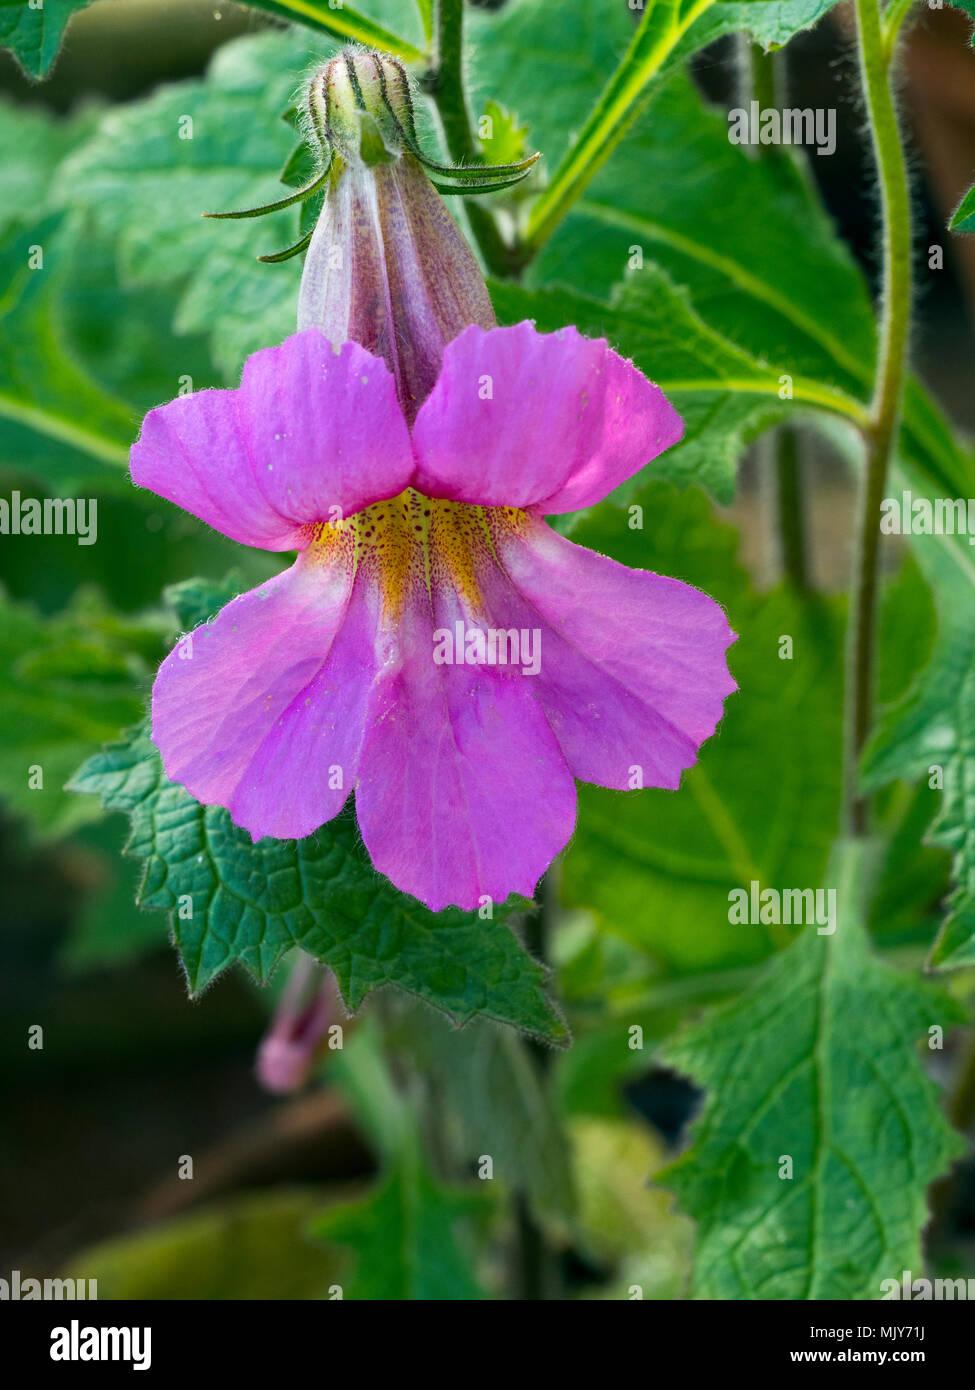 Rehmannia elata Chinese foxglove - Stock Image